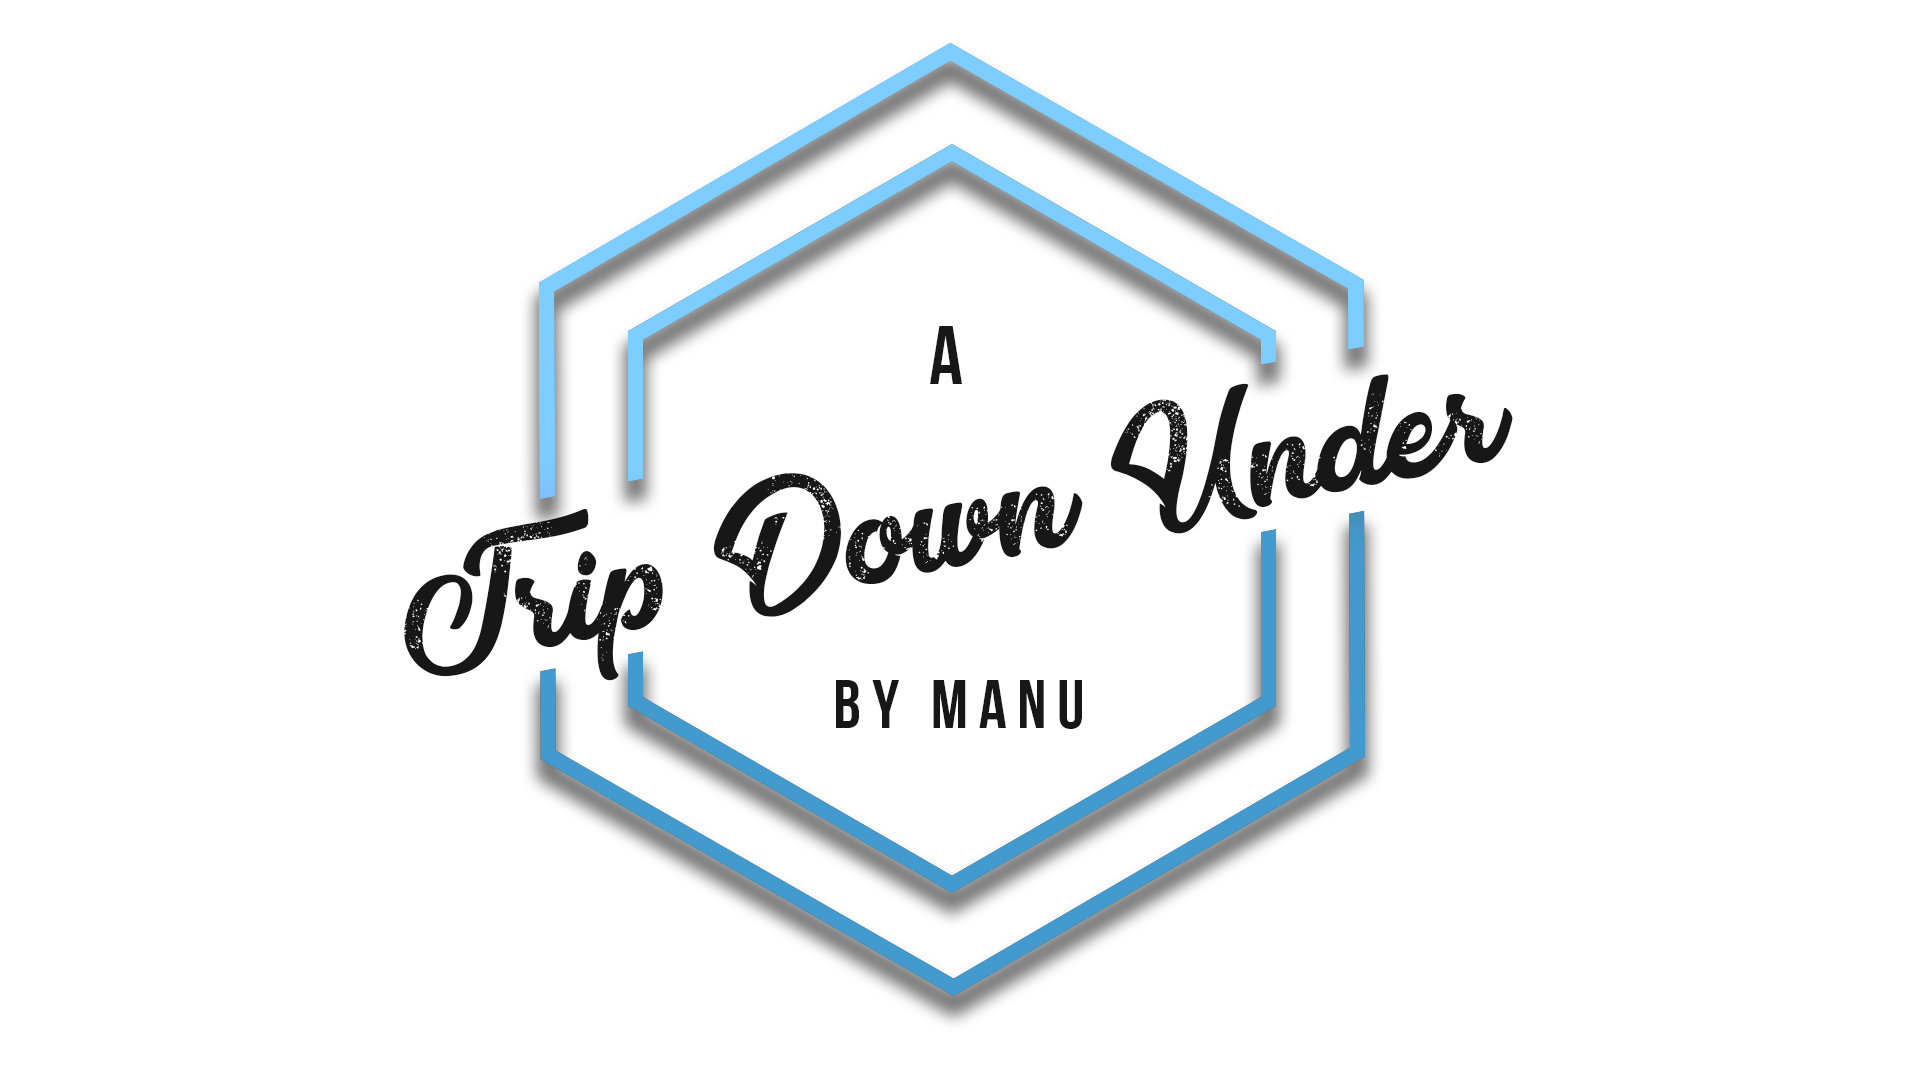 A Trip Down Under By Manu